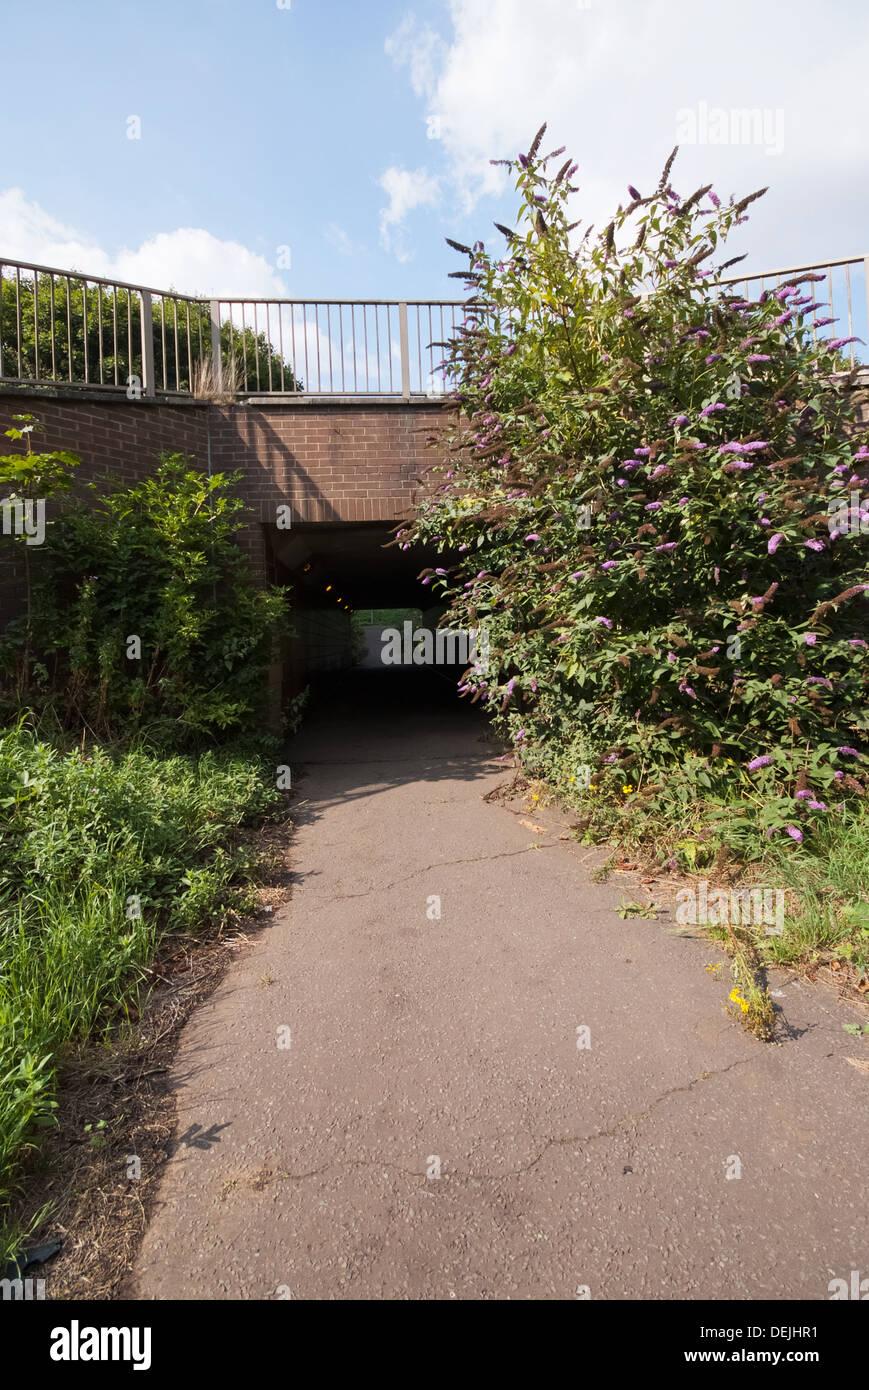 Overgrown Underpass - Stock Image